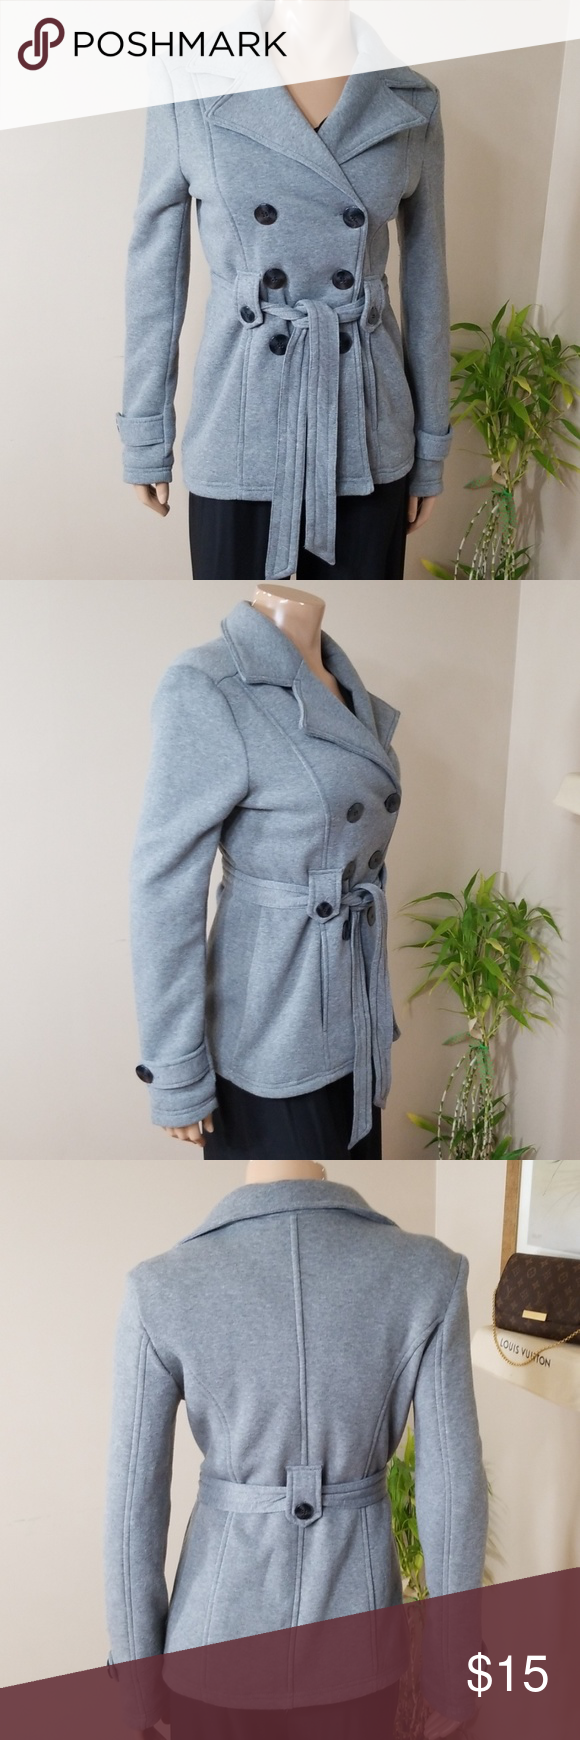 JOUJOU COAT in 2020 Coat, Clothes design, Colorful coat